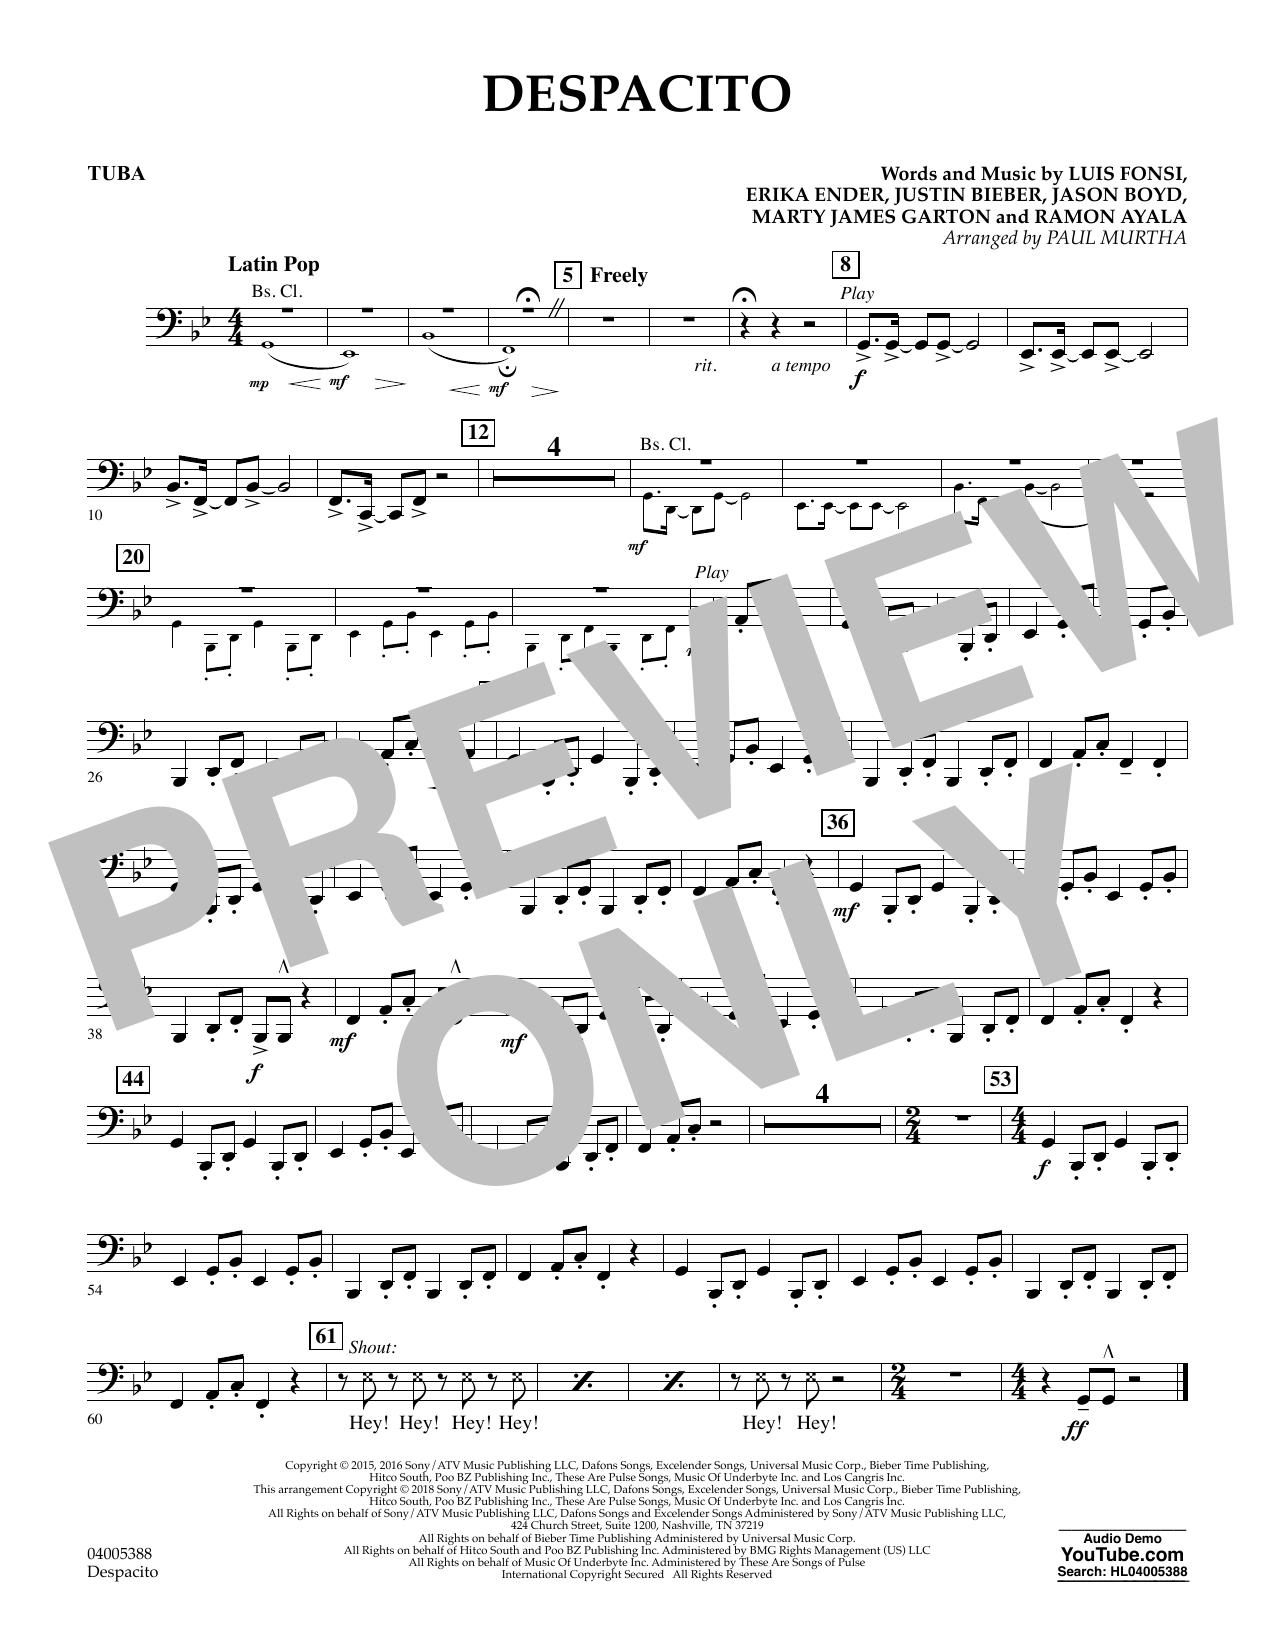 Despacito (arr. Paul Murtha) - Tuba (Concert Band)